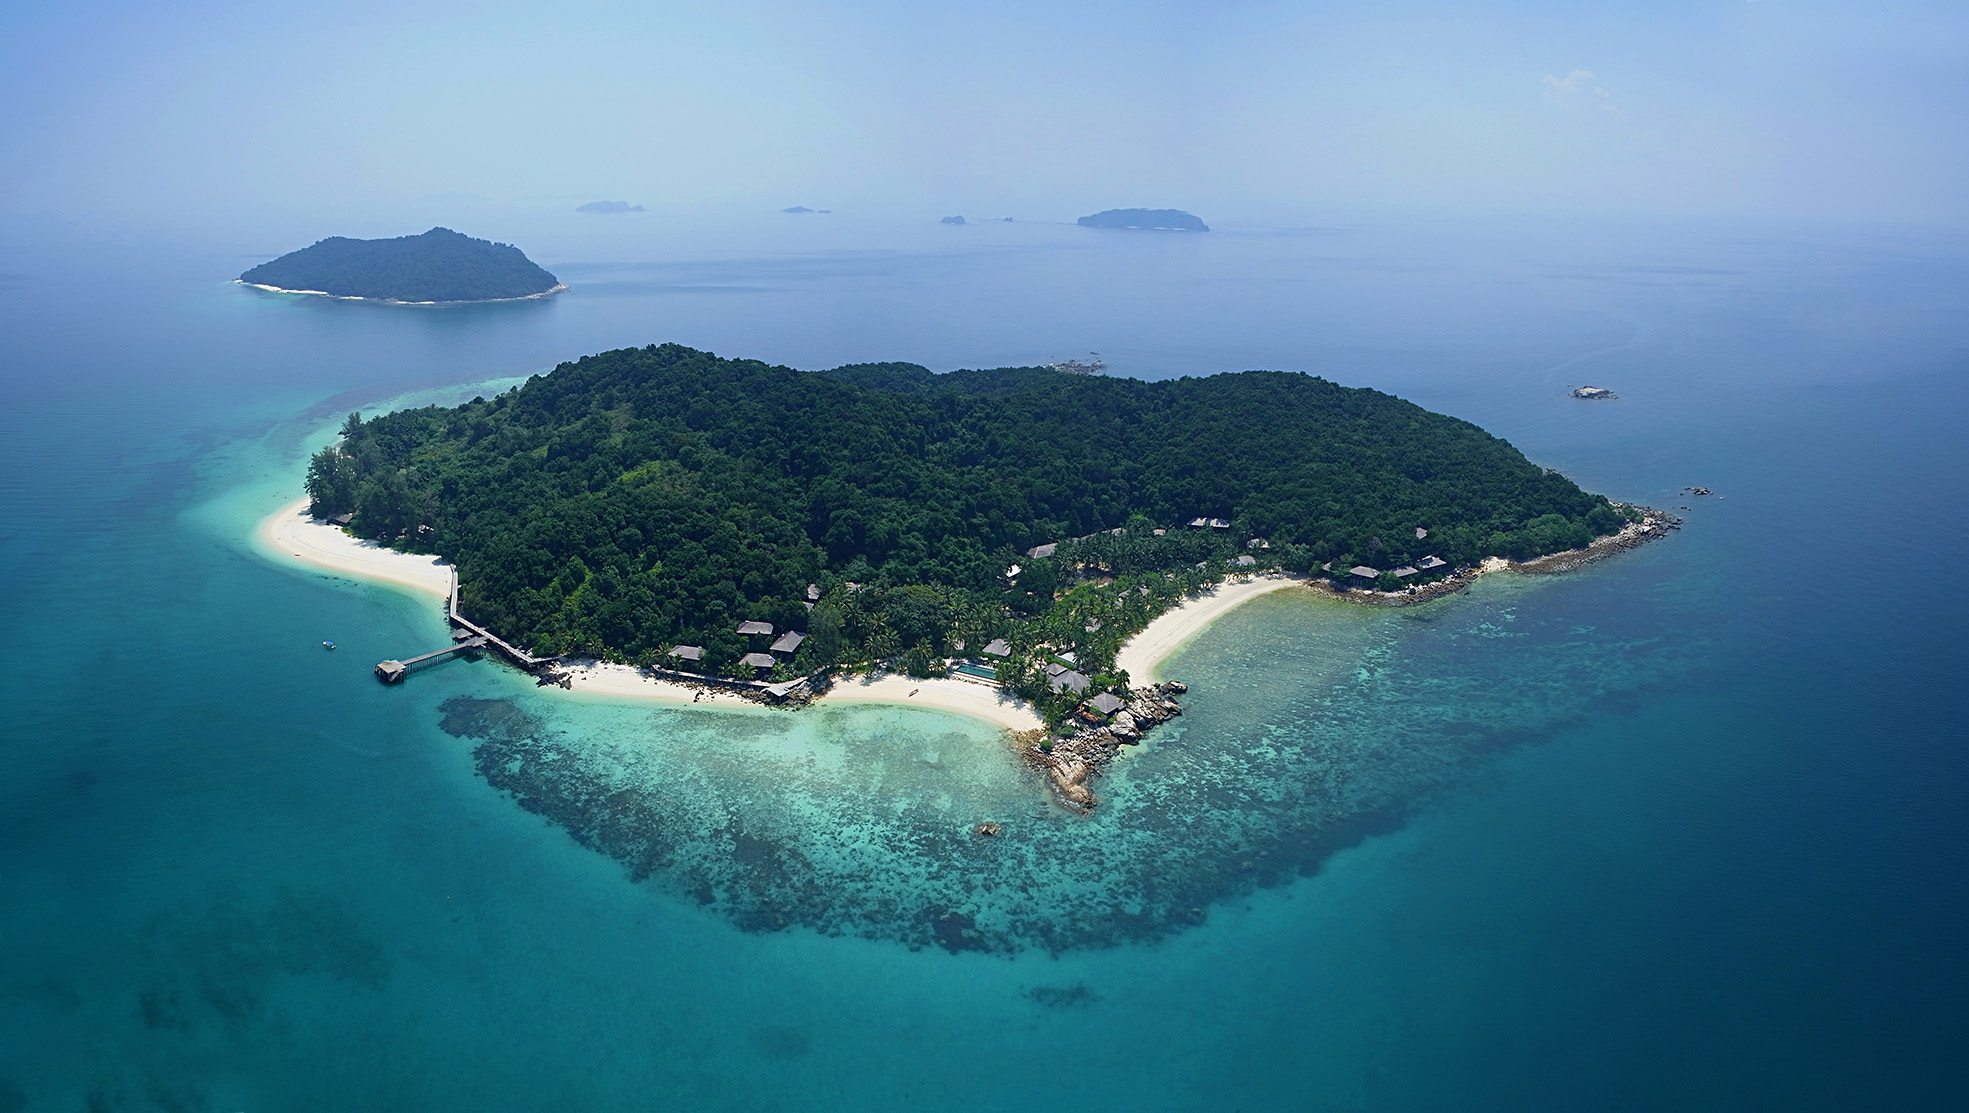 Charter-the-island-batu-batu-malaysia.jpg